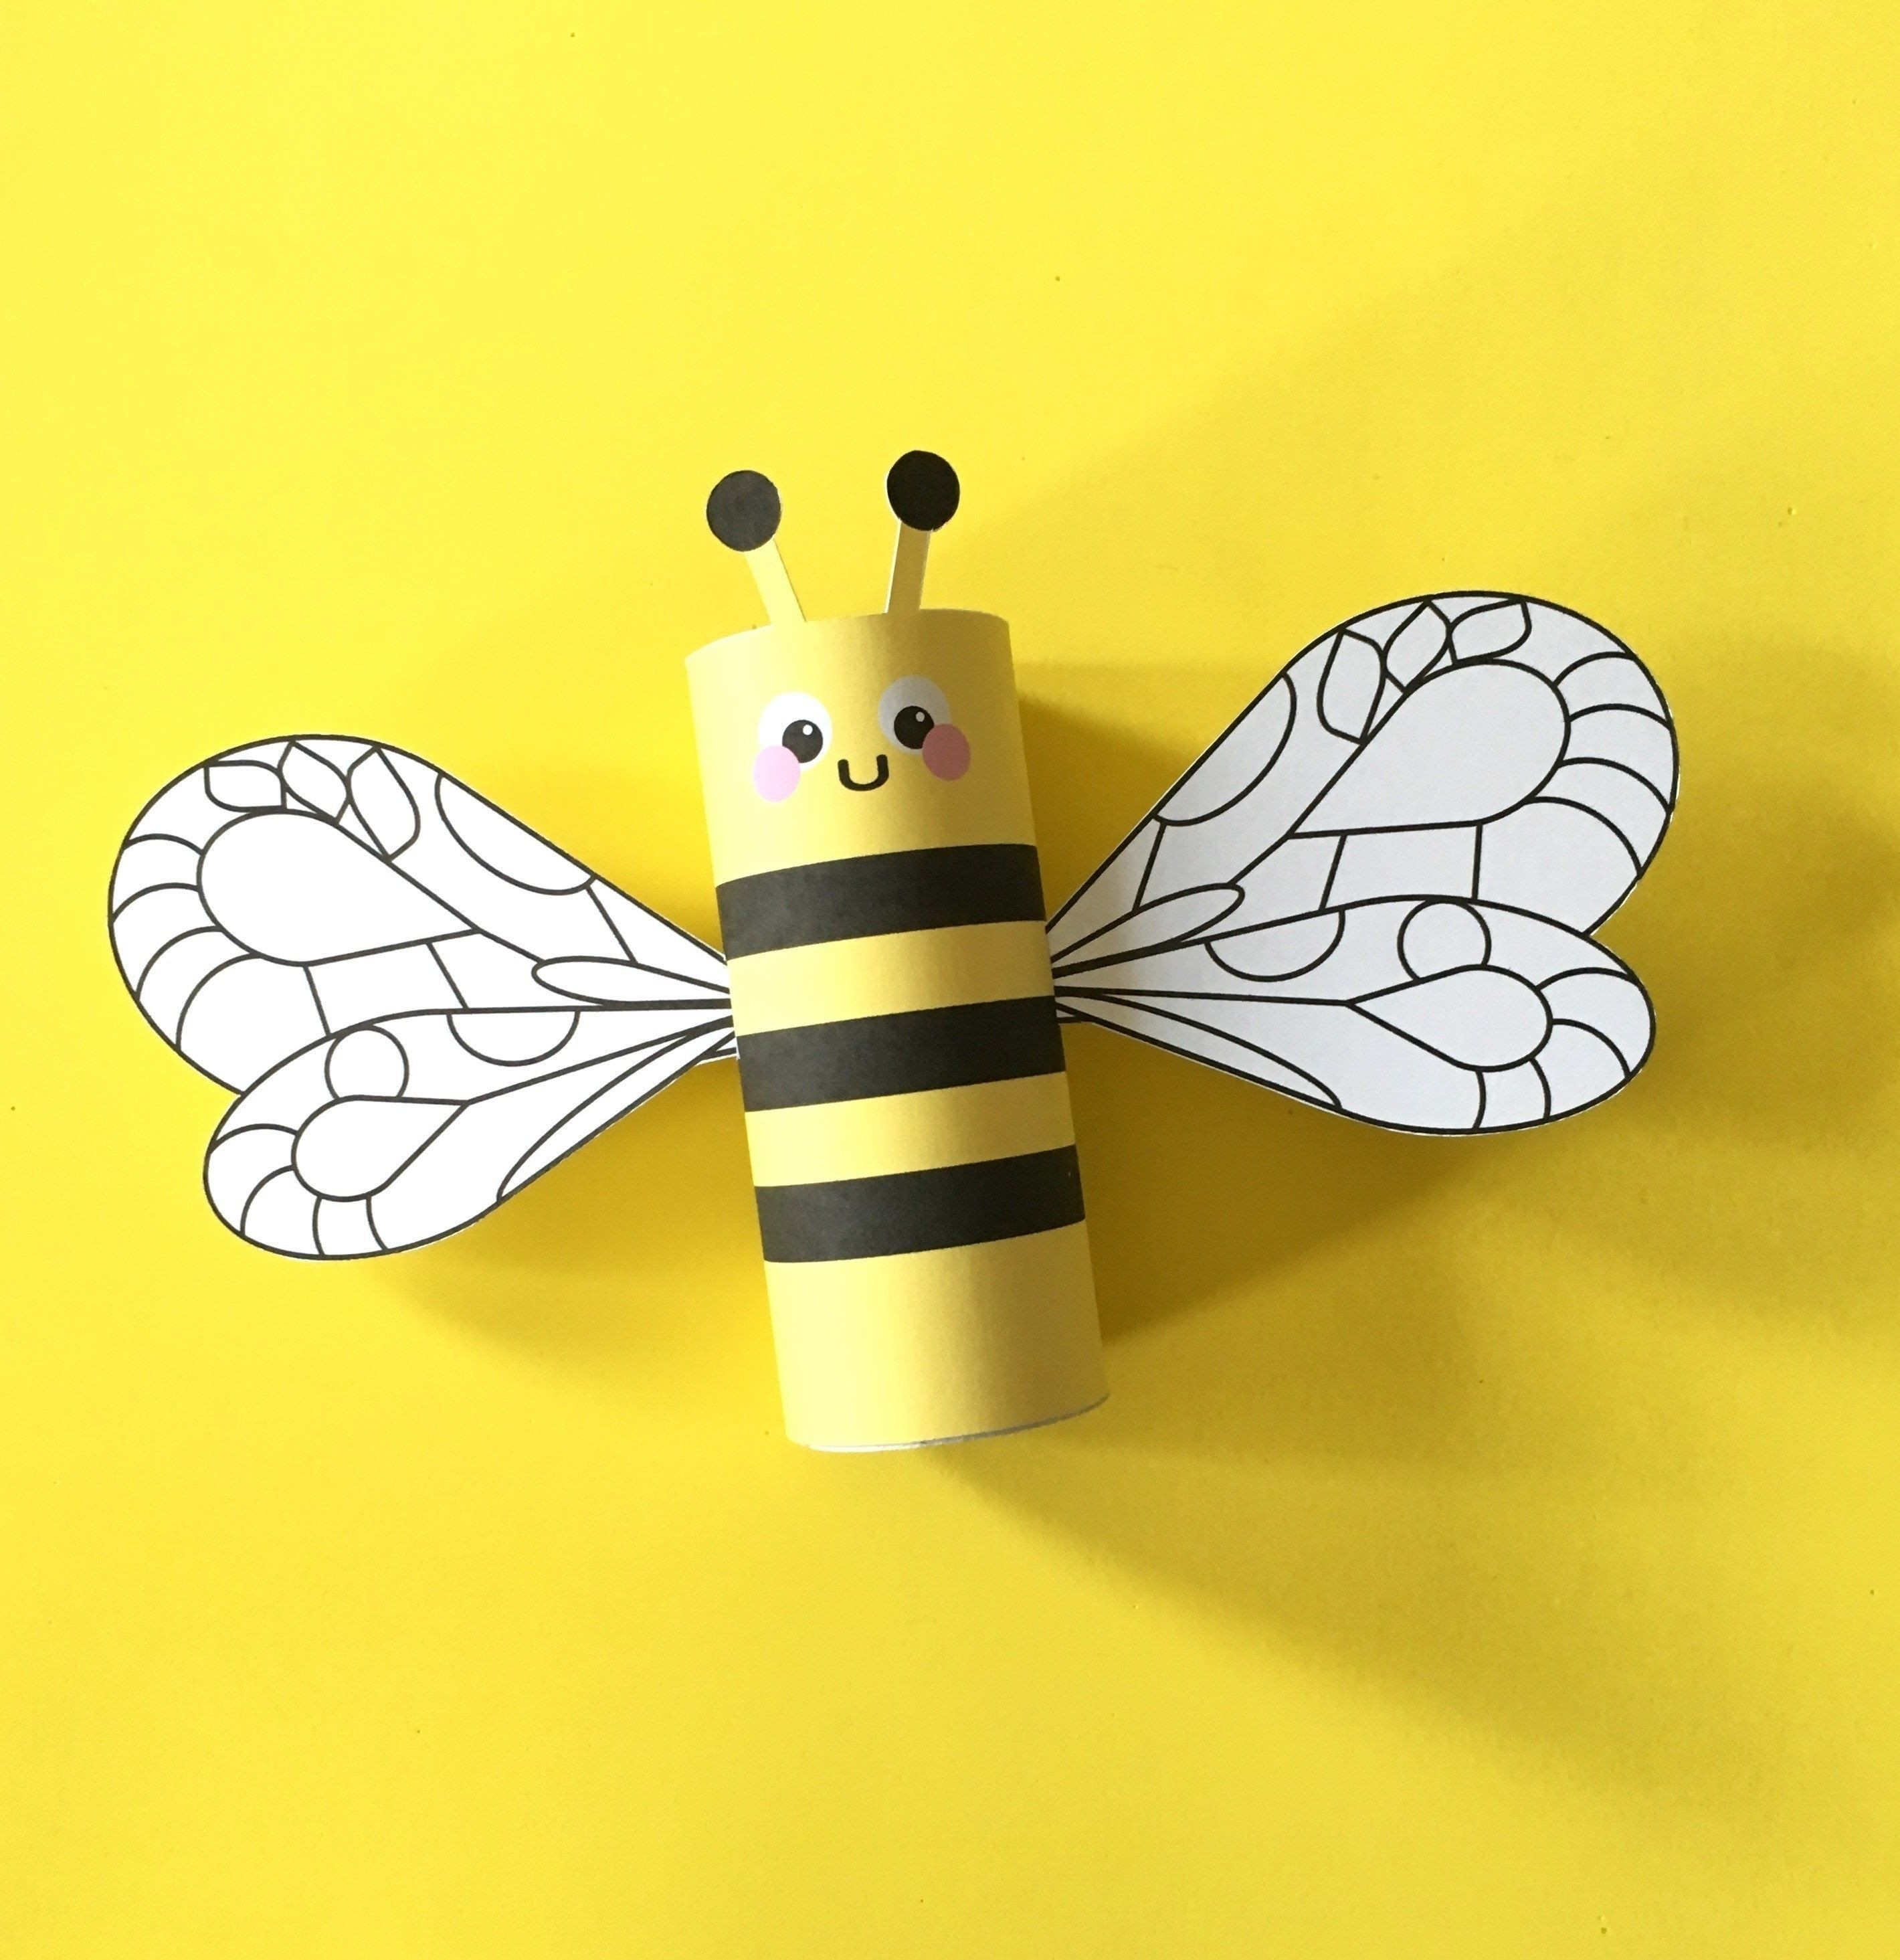 Bumblebee Papercraft Bumblebee toilet Tube Craft Printable Printables